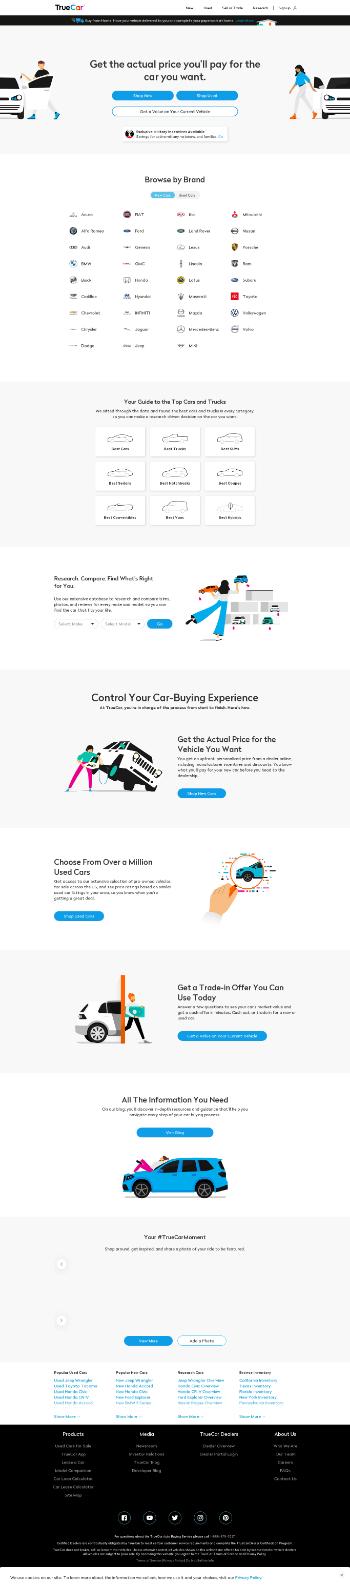 TrueCar, Inc. Website Screenshot